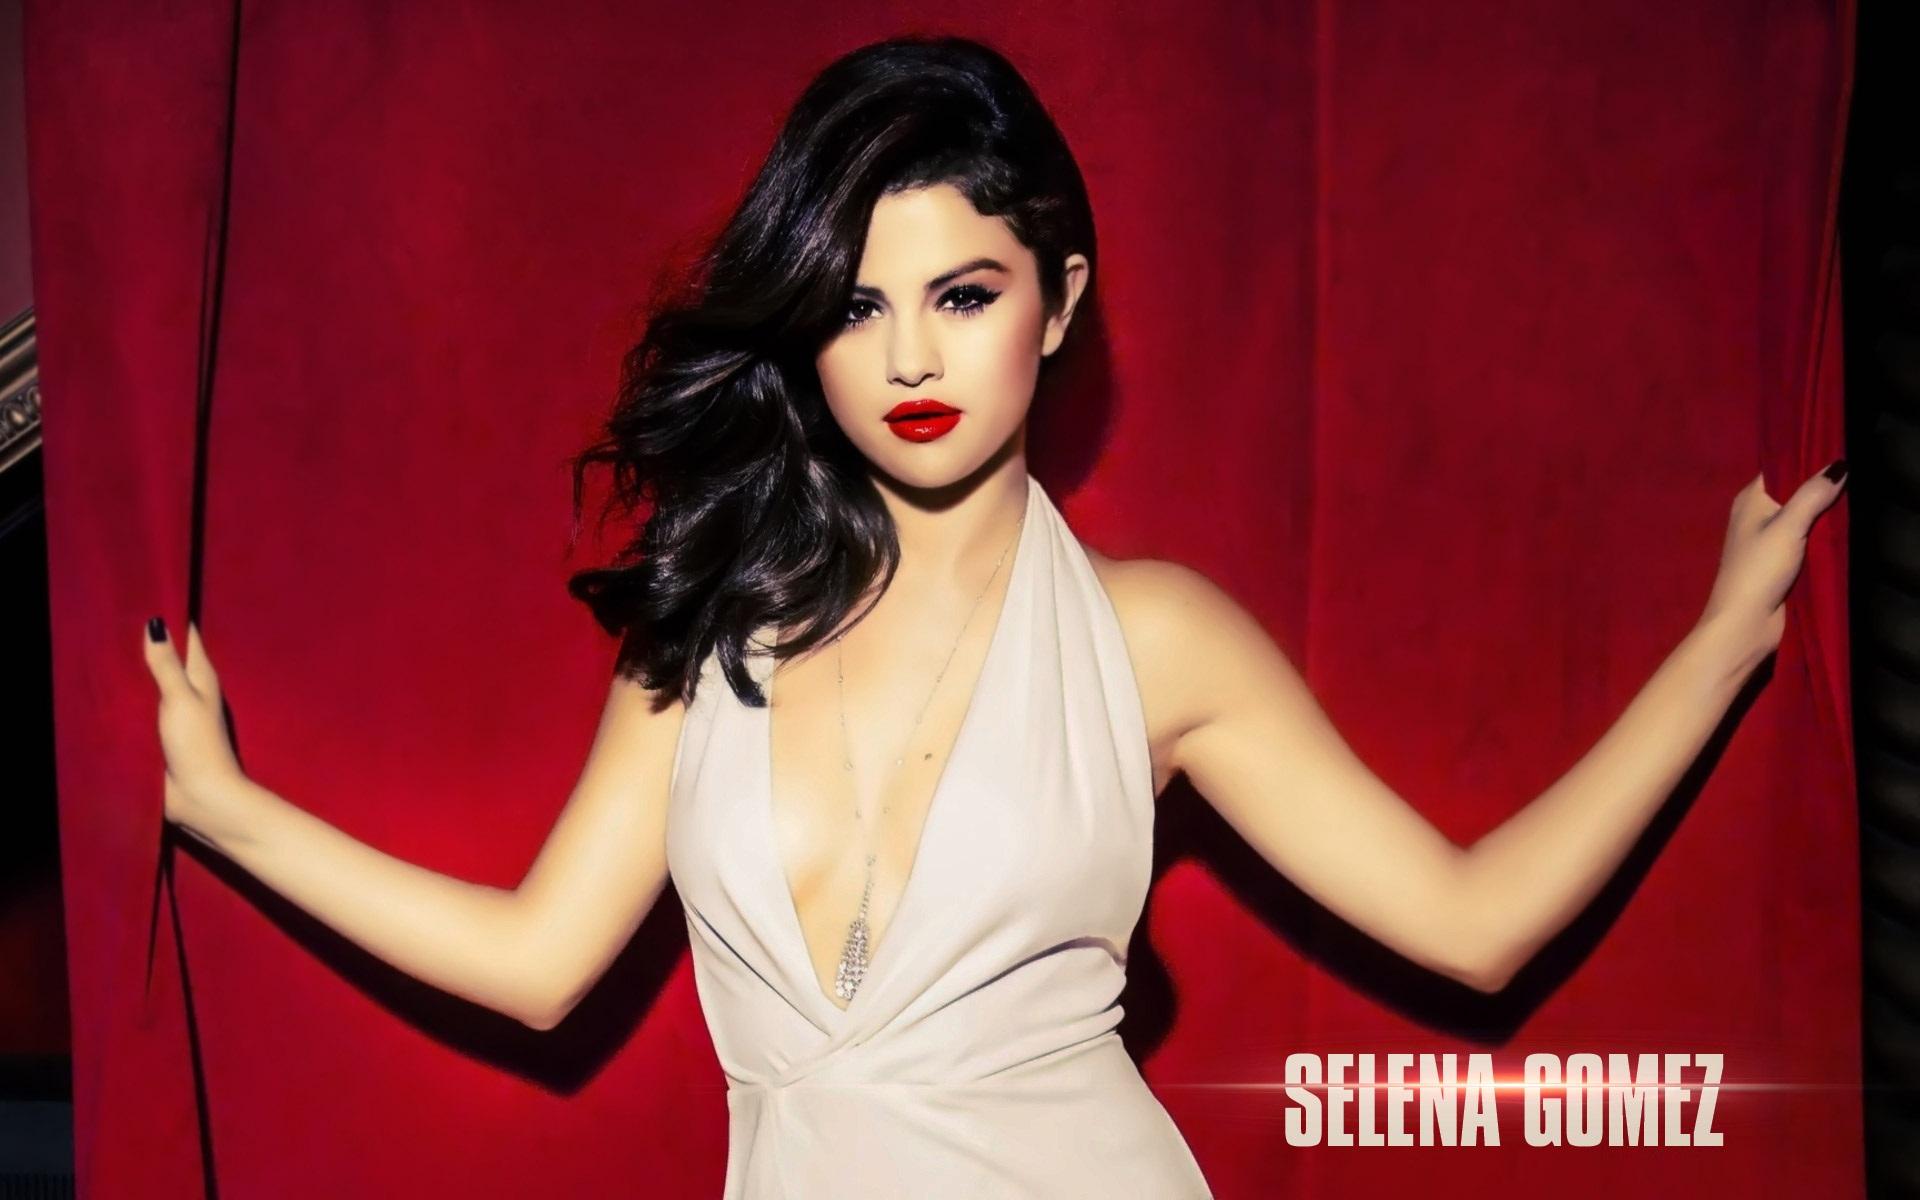 Selena Gomez Sexy Wallpapers 1080p Wide Screen Wallpaper 1080p2k4k